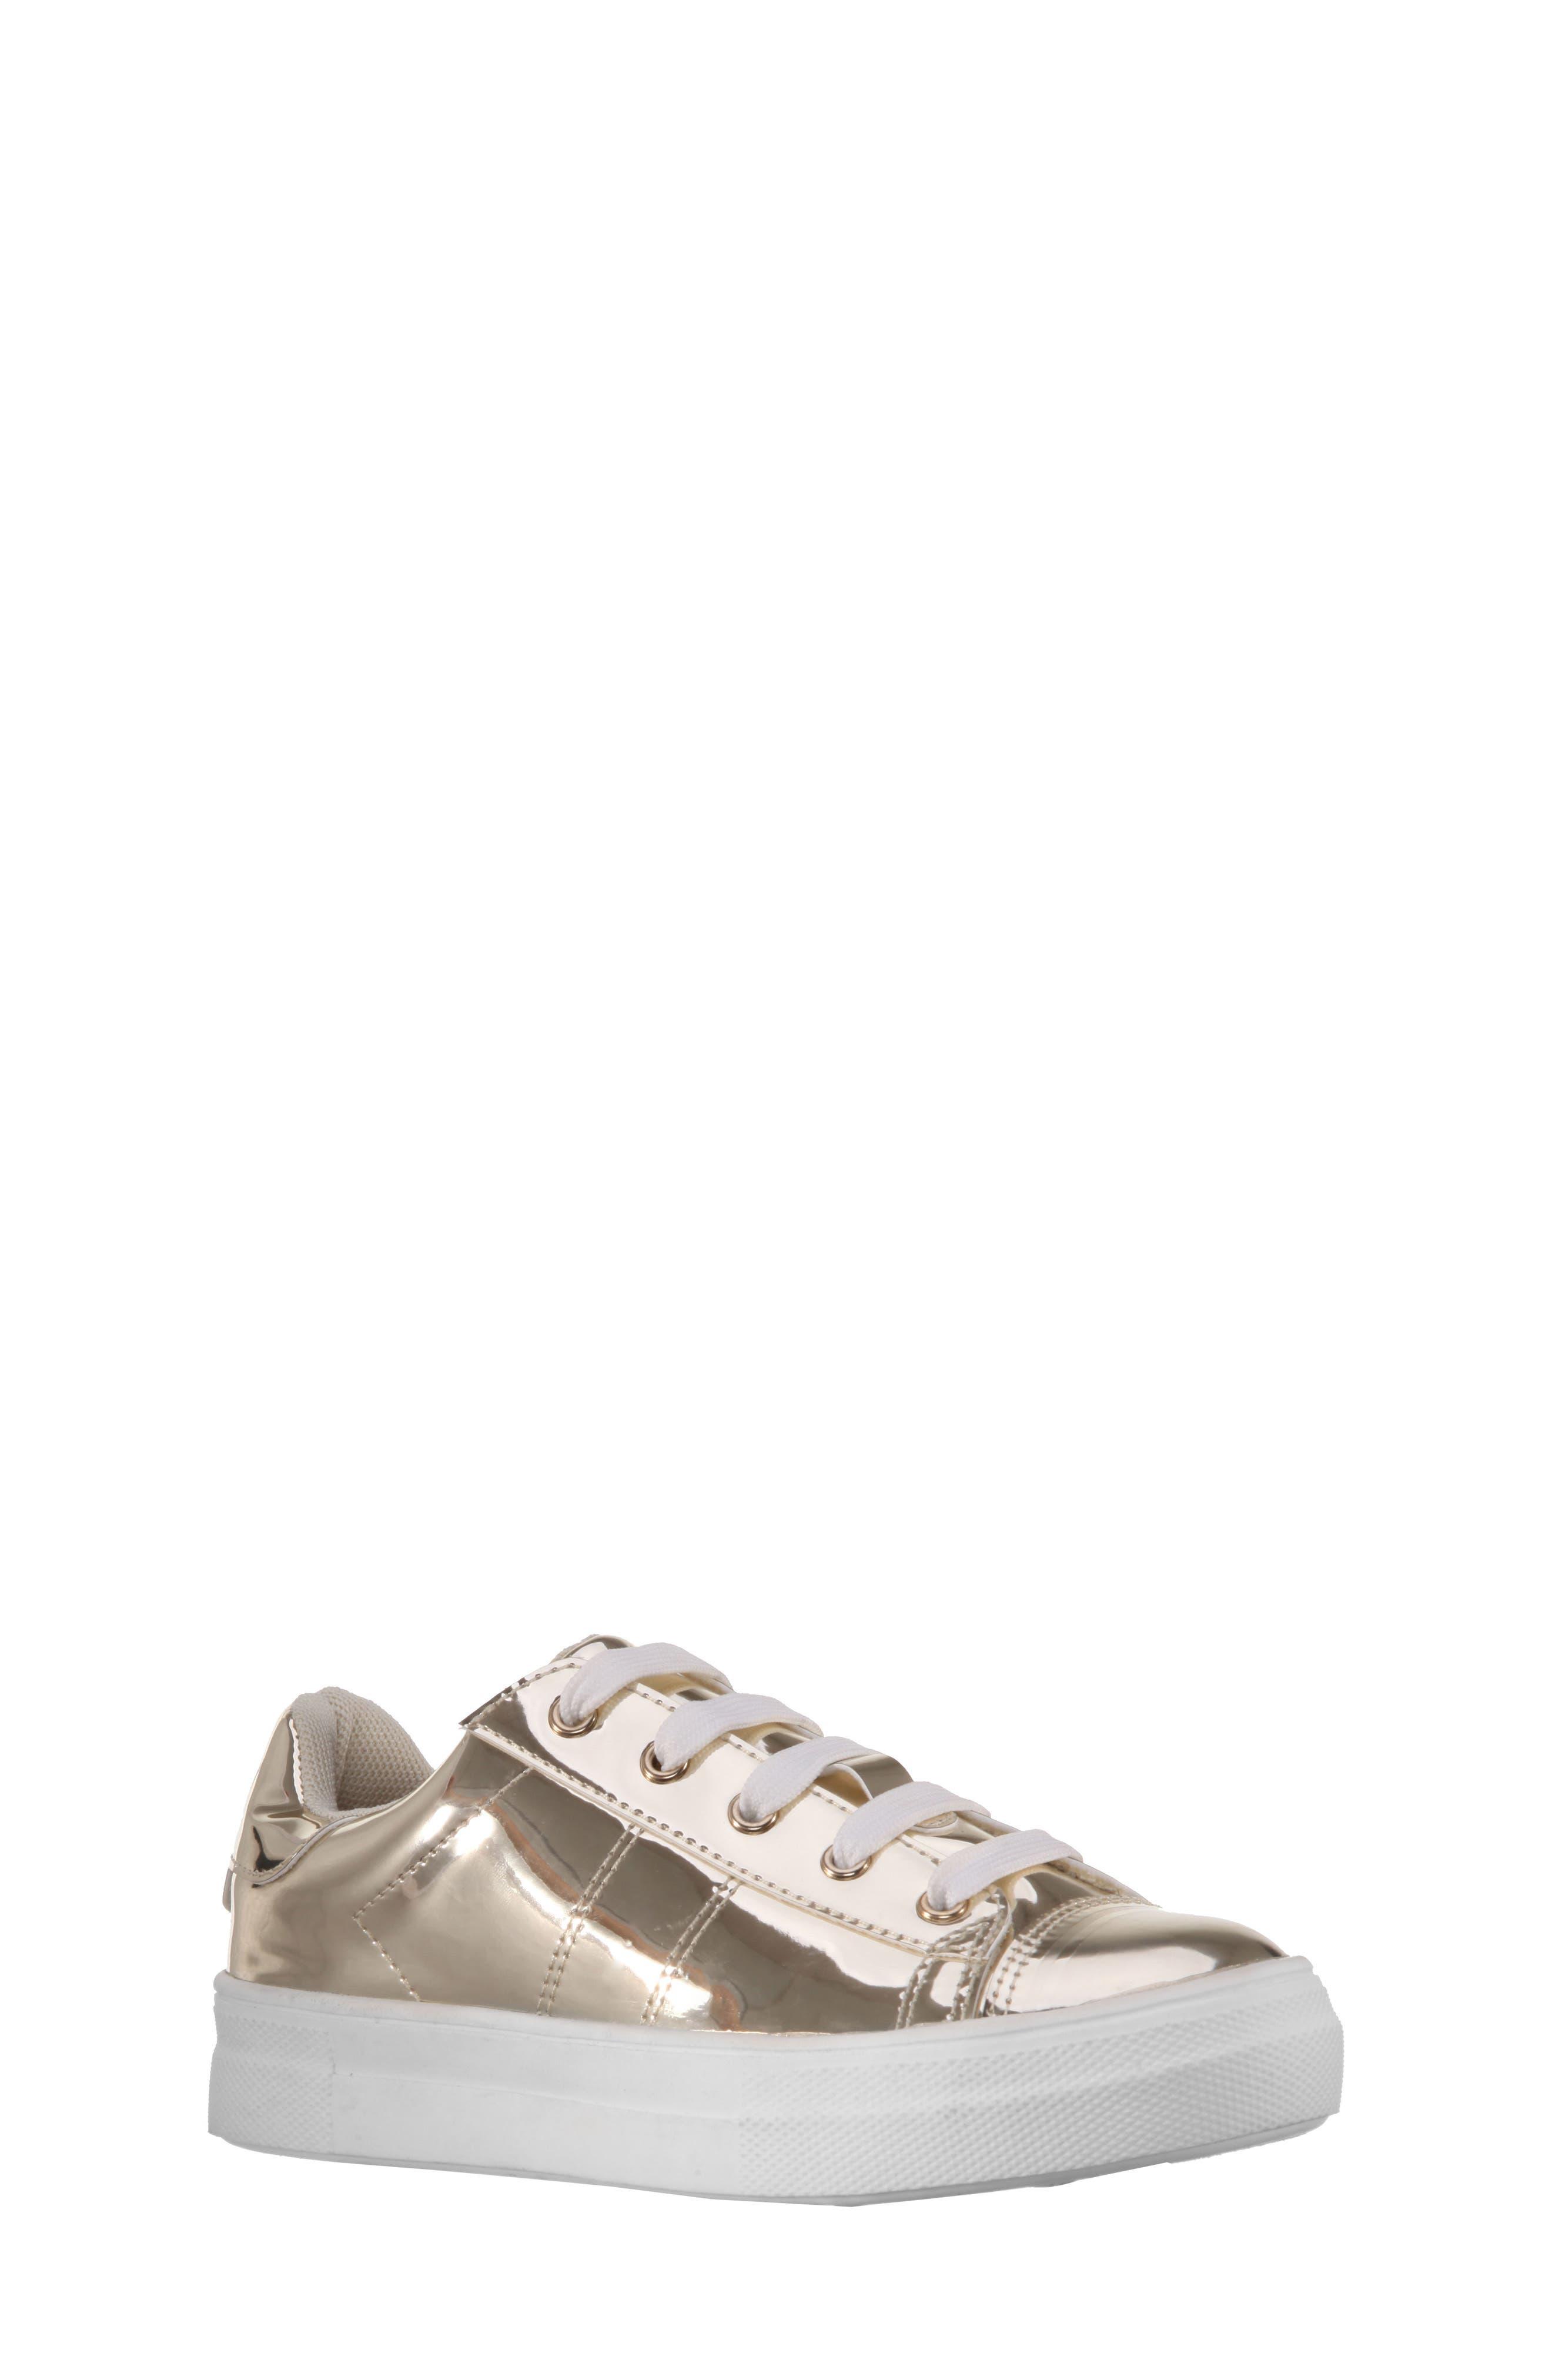 Rochella Metallic Sneaker,                         Main,                         color, Platino Mirror Metallic